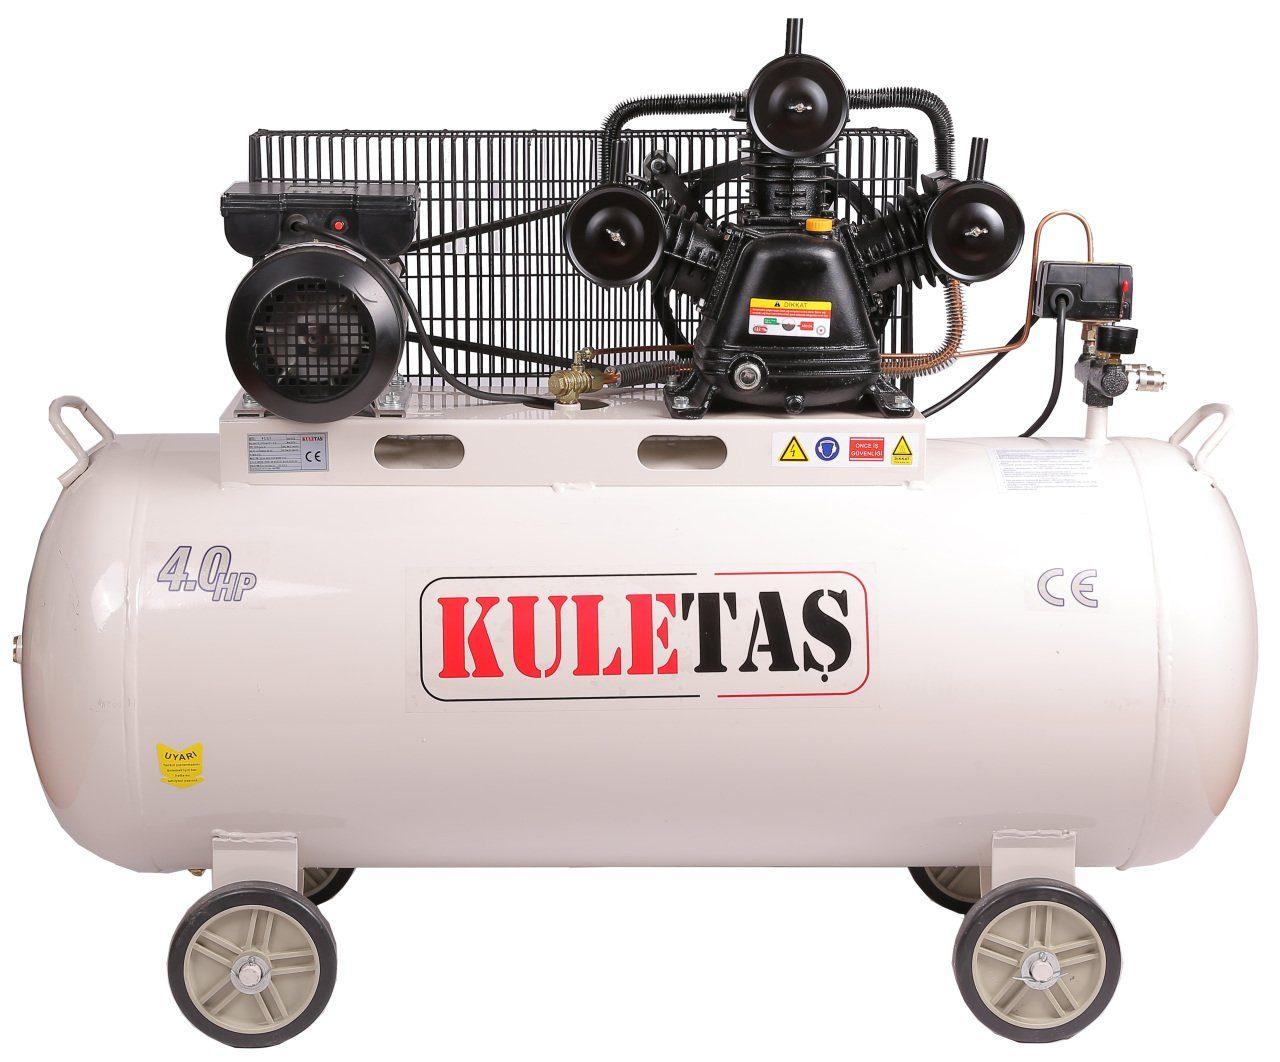 kuletas-kompresor-200-litre